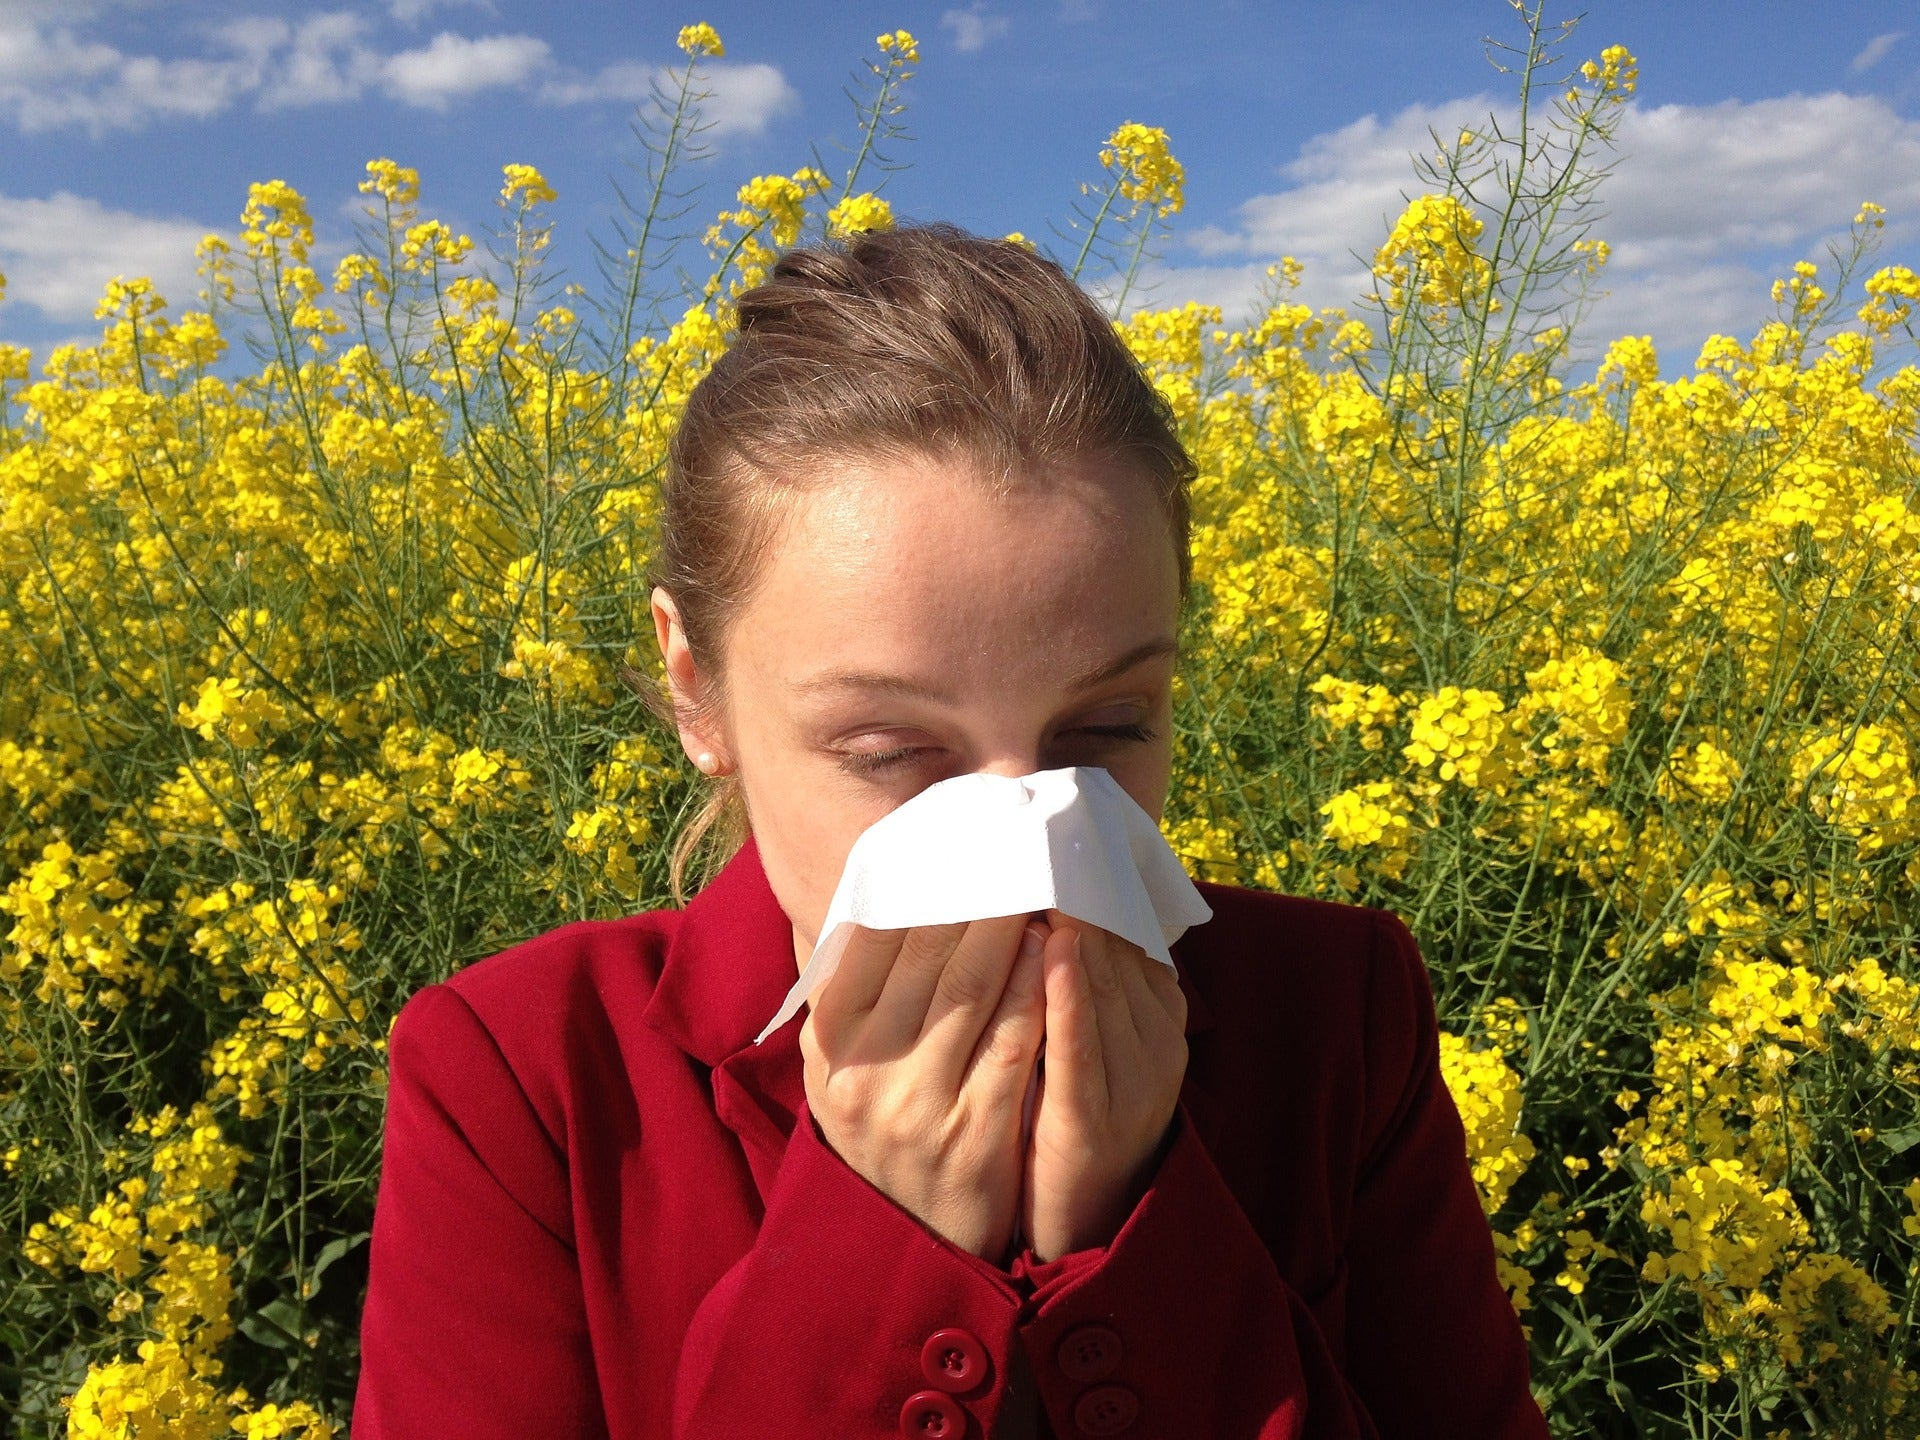 allergyactionplangirlishavinganallergypoorgirl